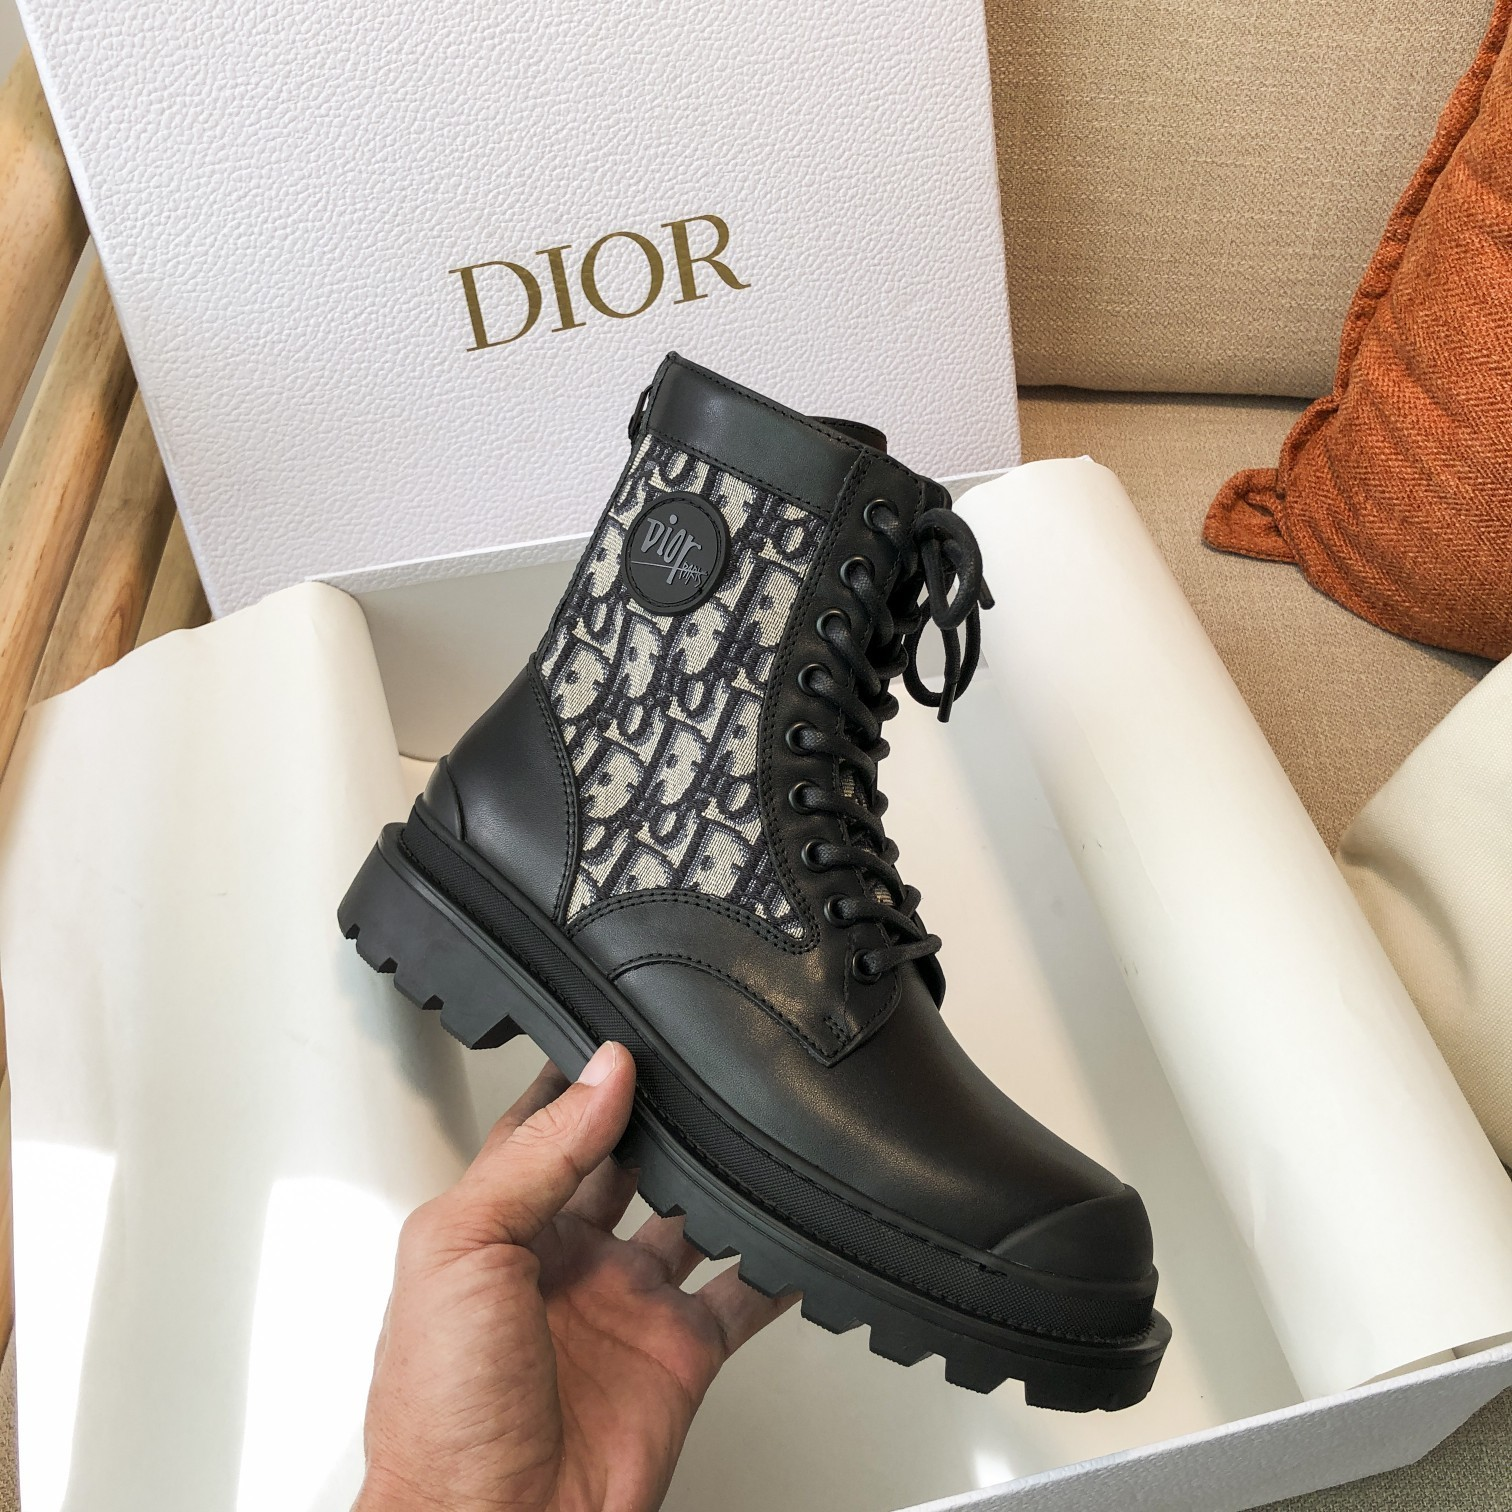 Dior高版本情侣 款2020ss秋冬新款字母厚底系带机车靴,秋冬T台走秀同款(图4)